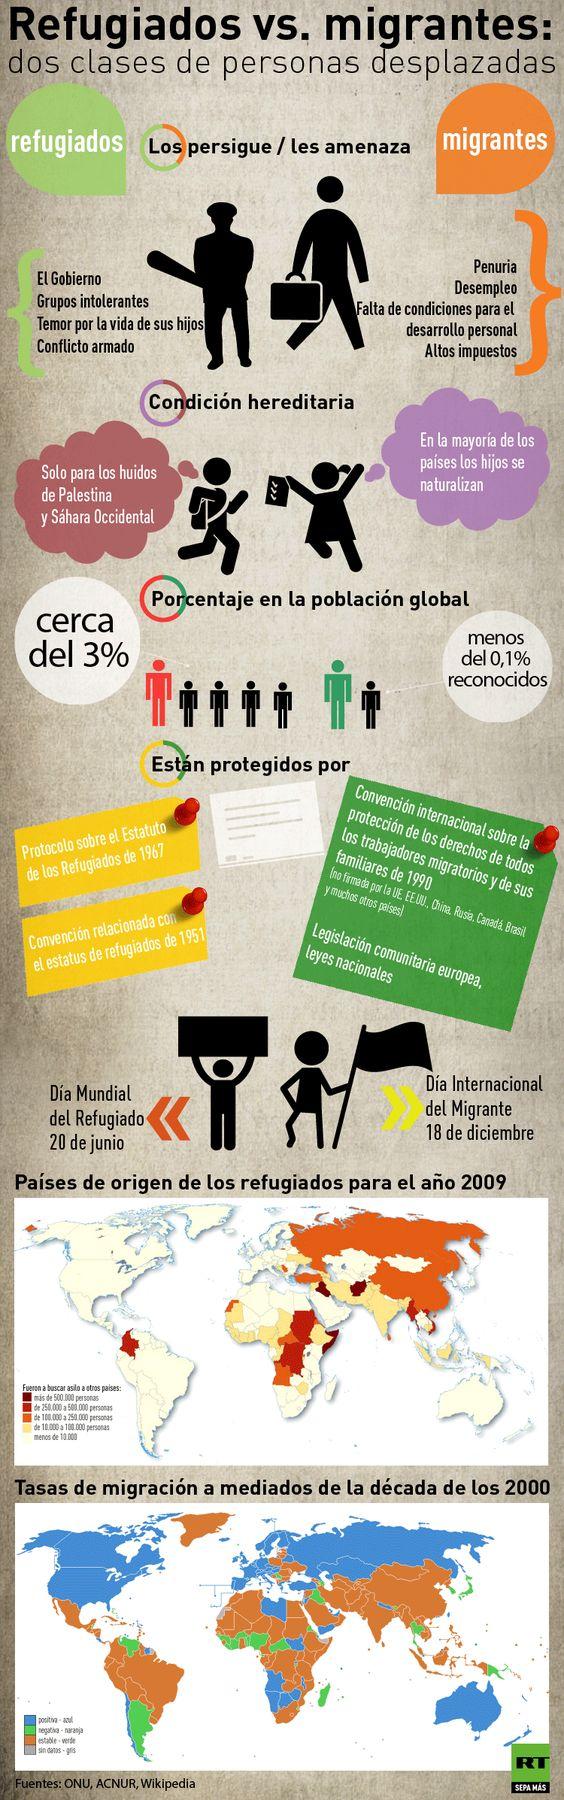 Refugiados vs. migrantes @actualidadrt